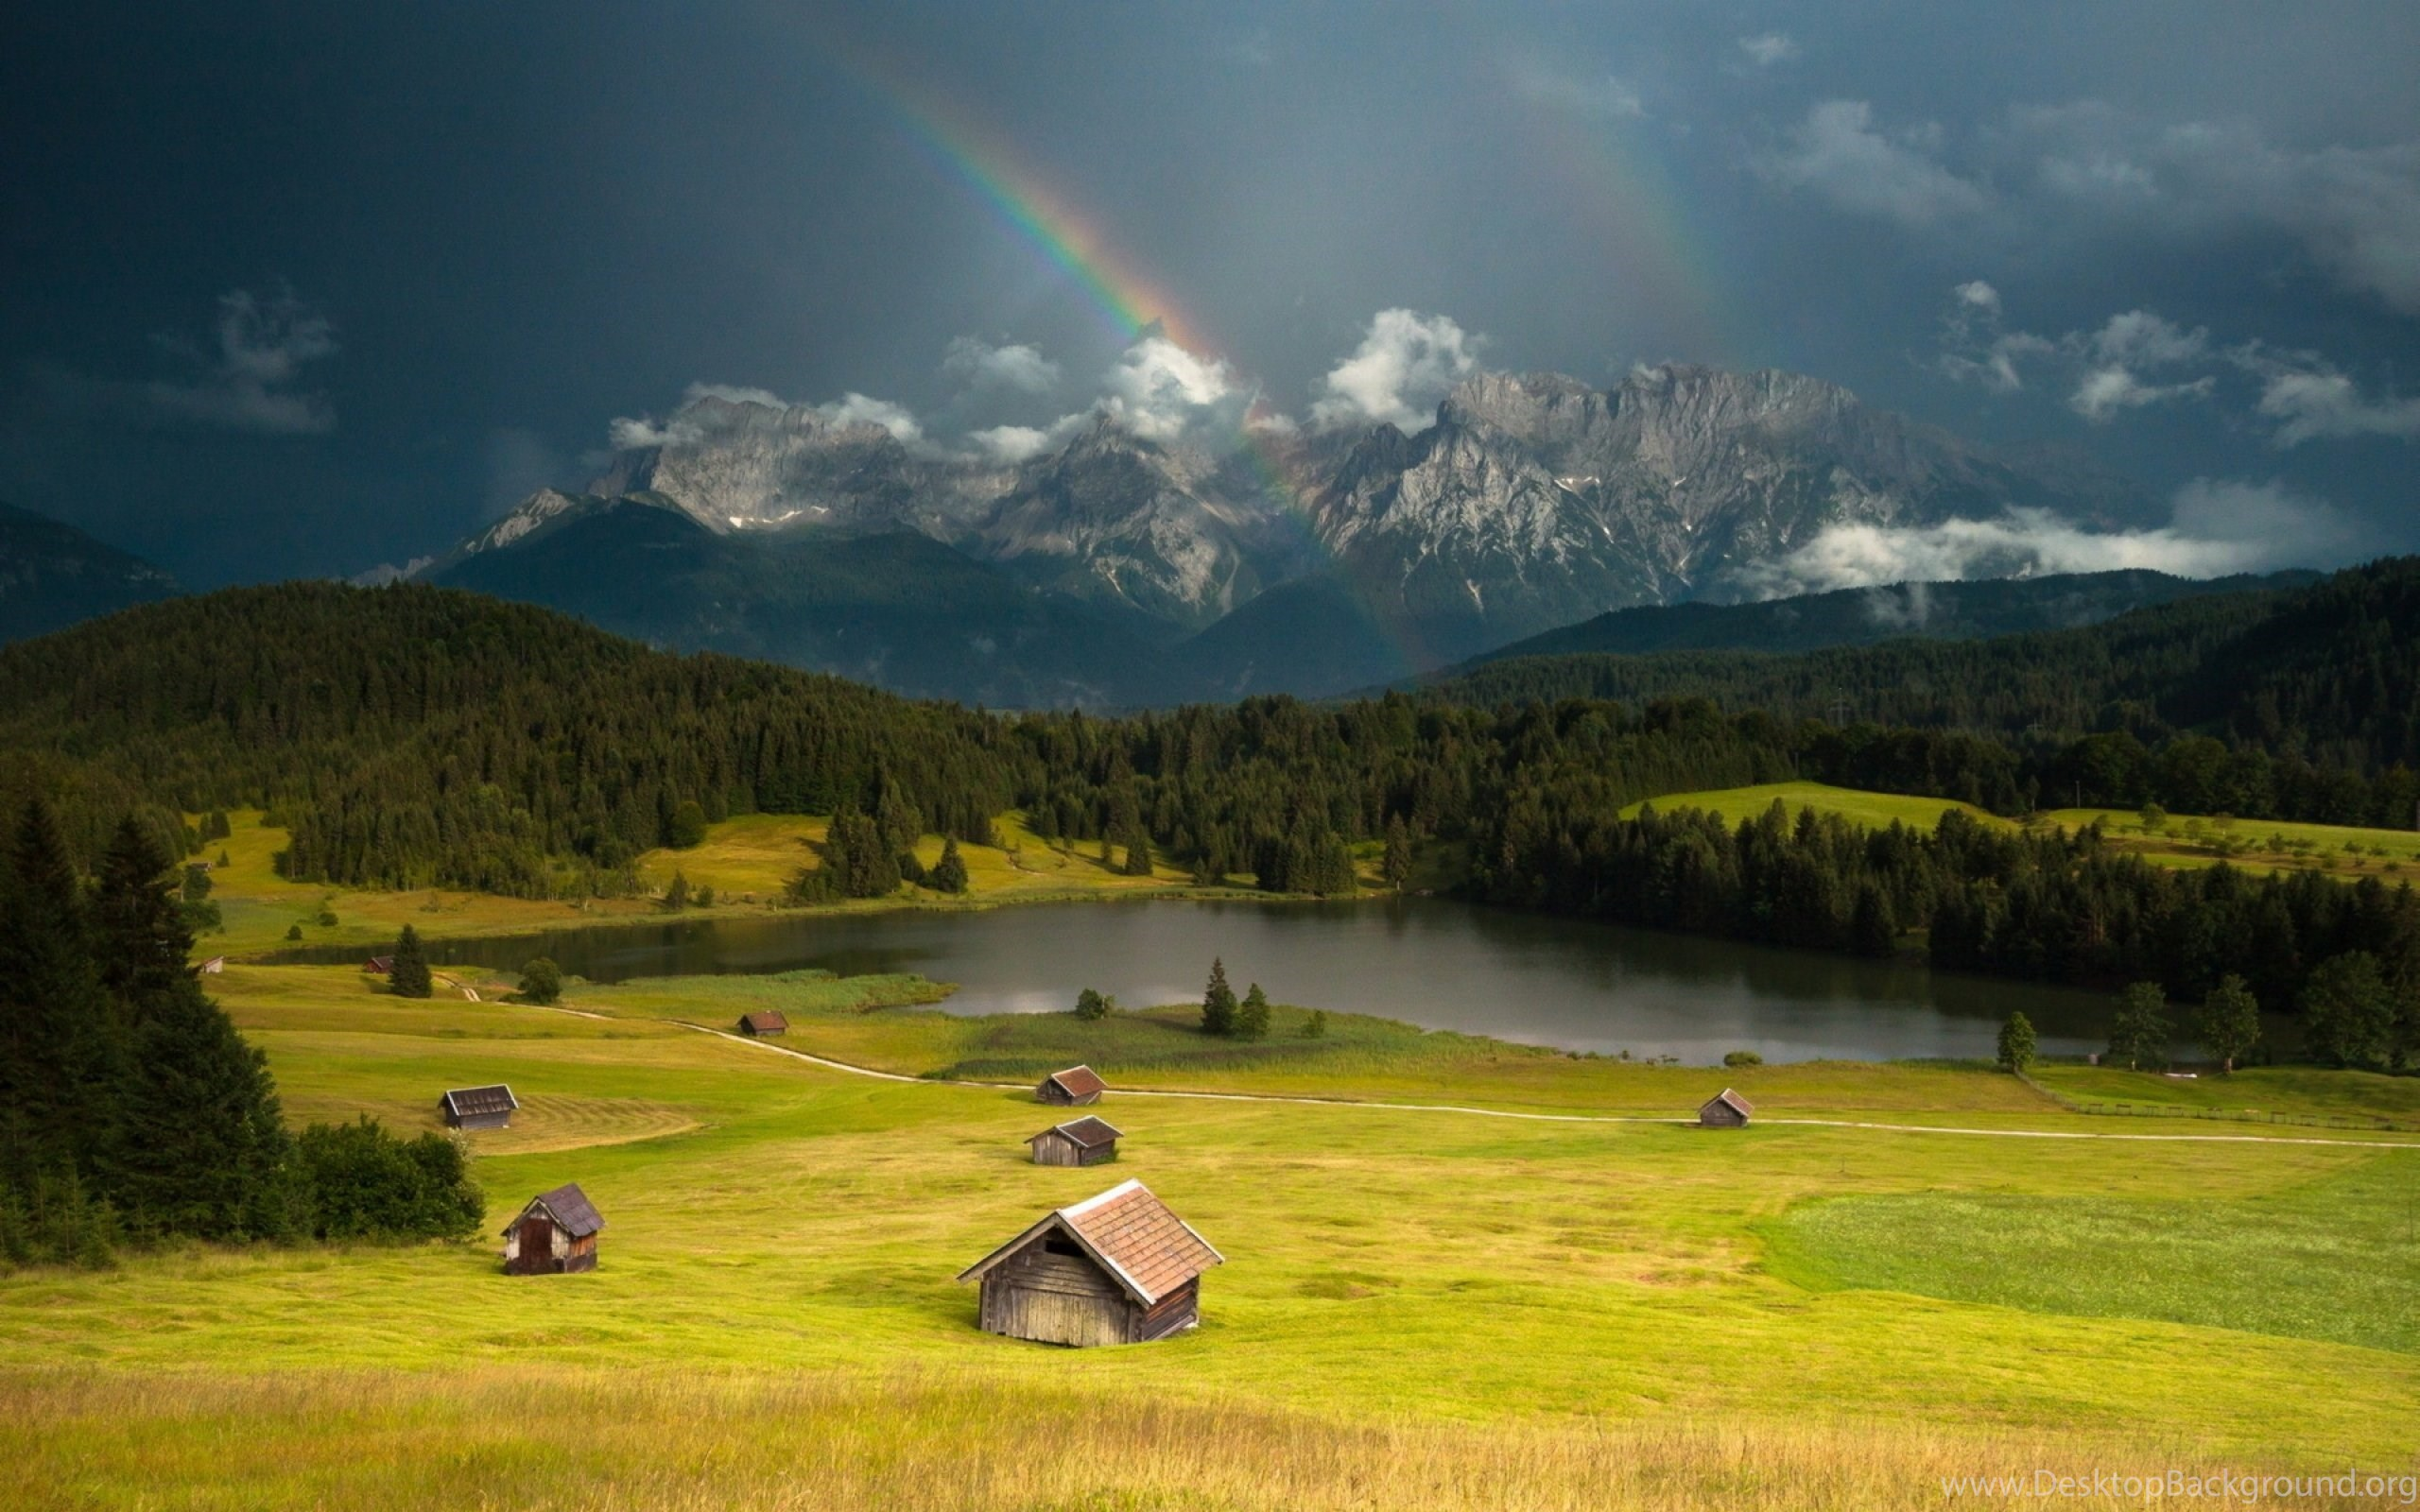 Mountains Landscape Nature Mountain Rainbow Rain Rustic Farm